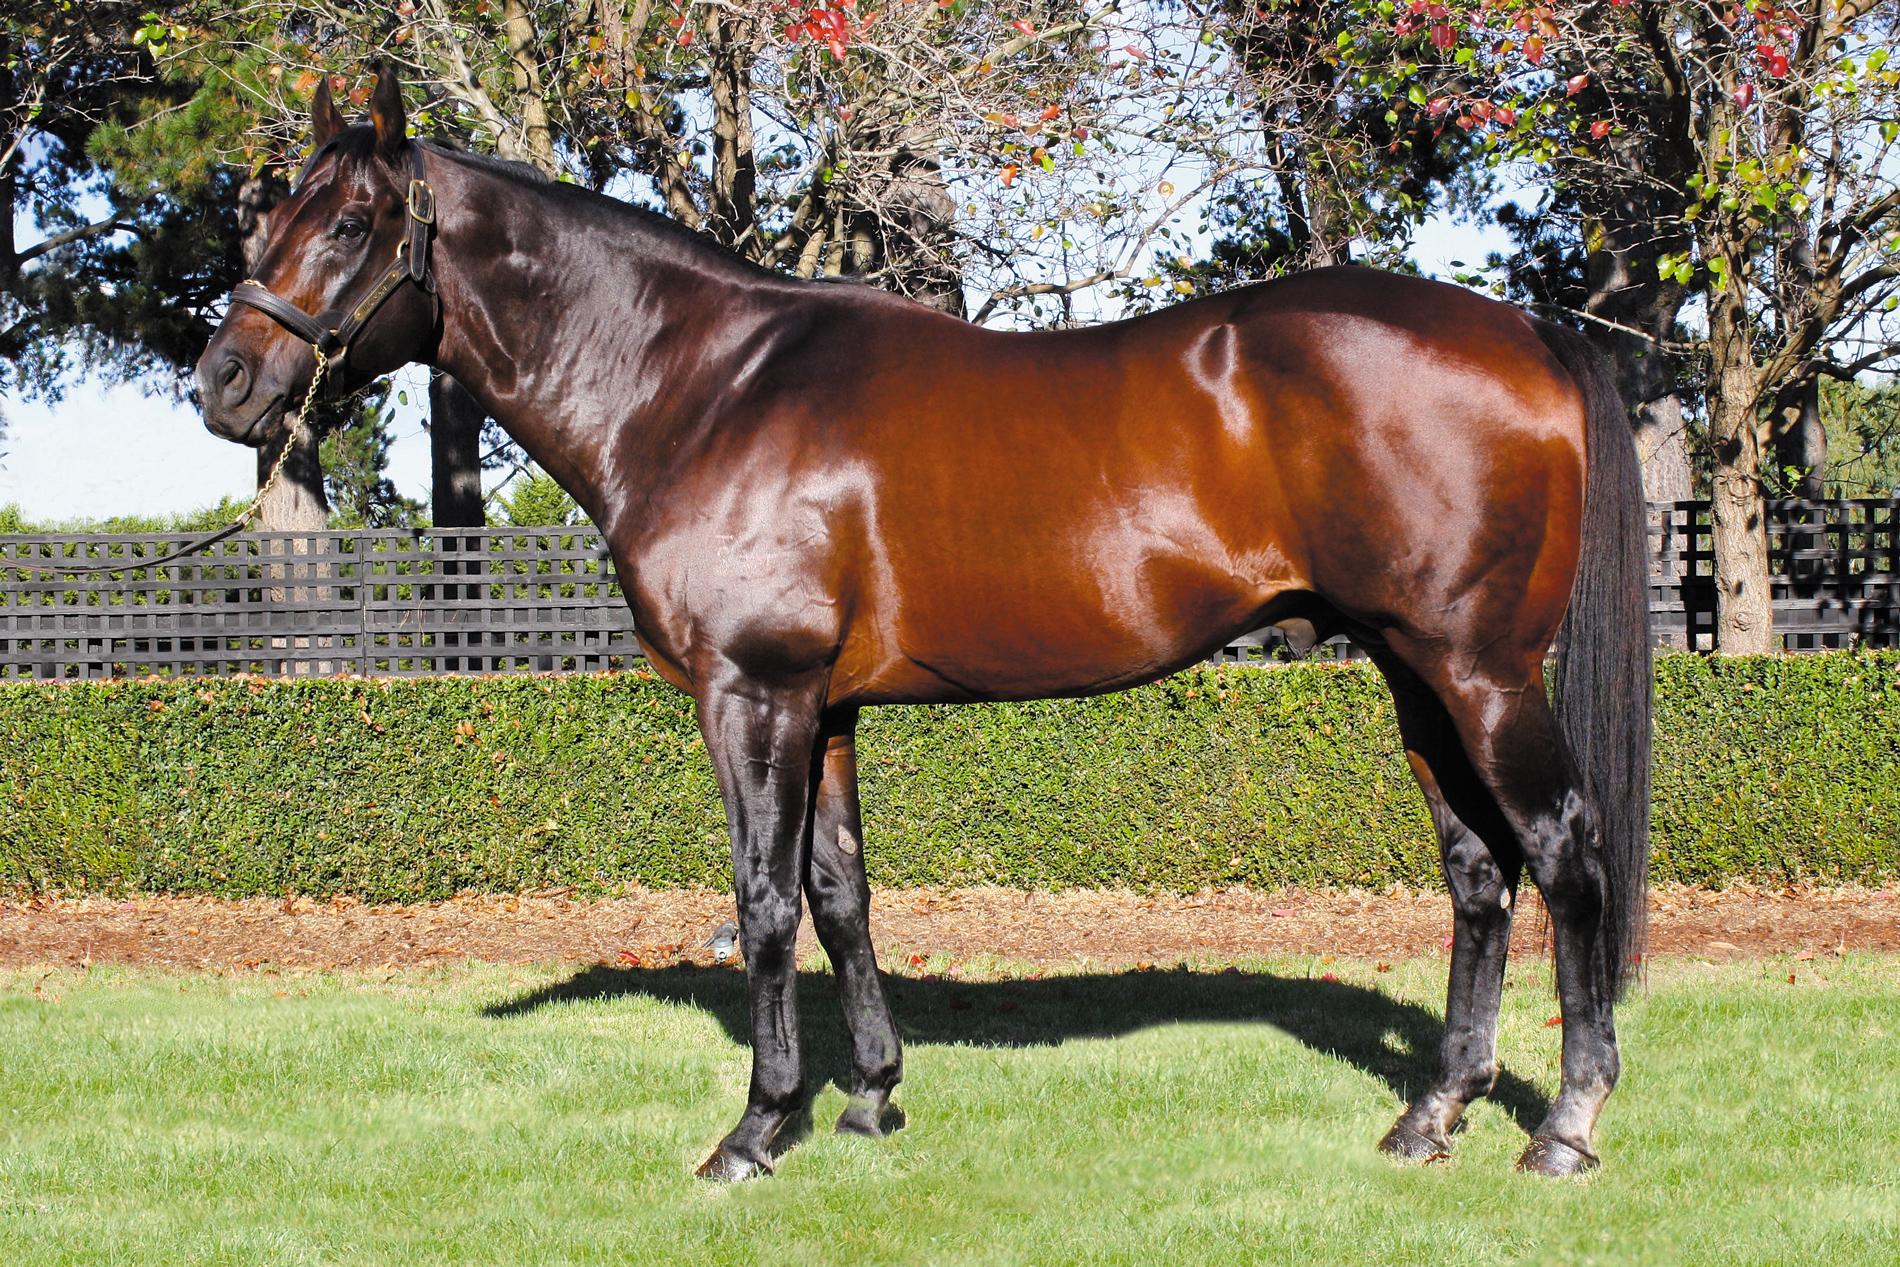 https://www.stallions.com.au/wp-content/uploads/2019/10/Bel-Esprit_edited_2015-WEB.jpg